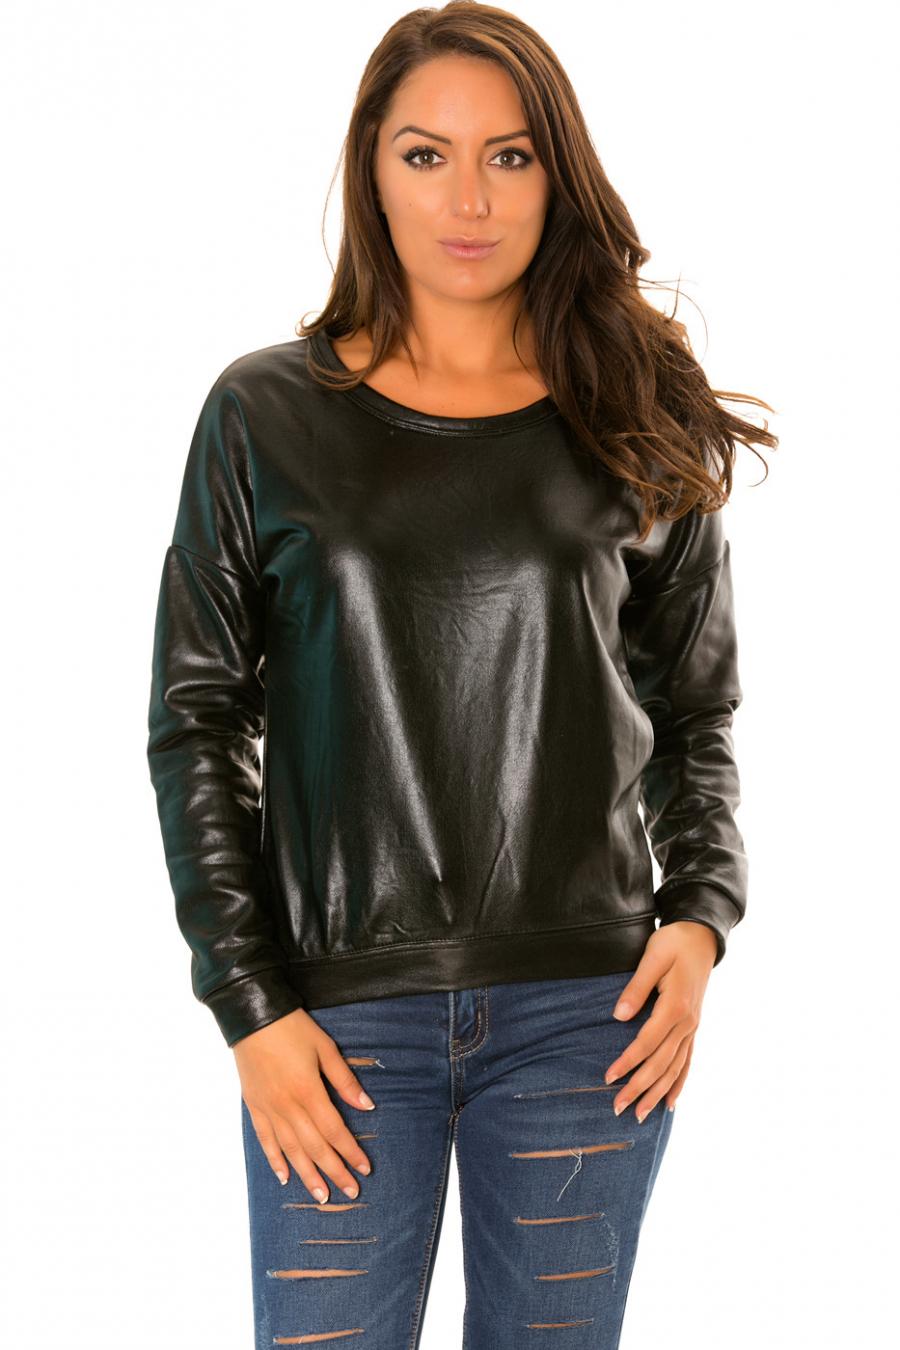 Pull manches longues Noir style retro brillant. WJ-3871